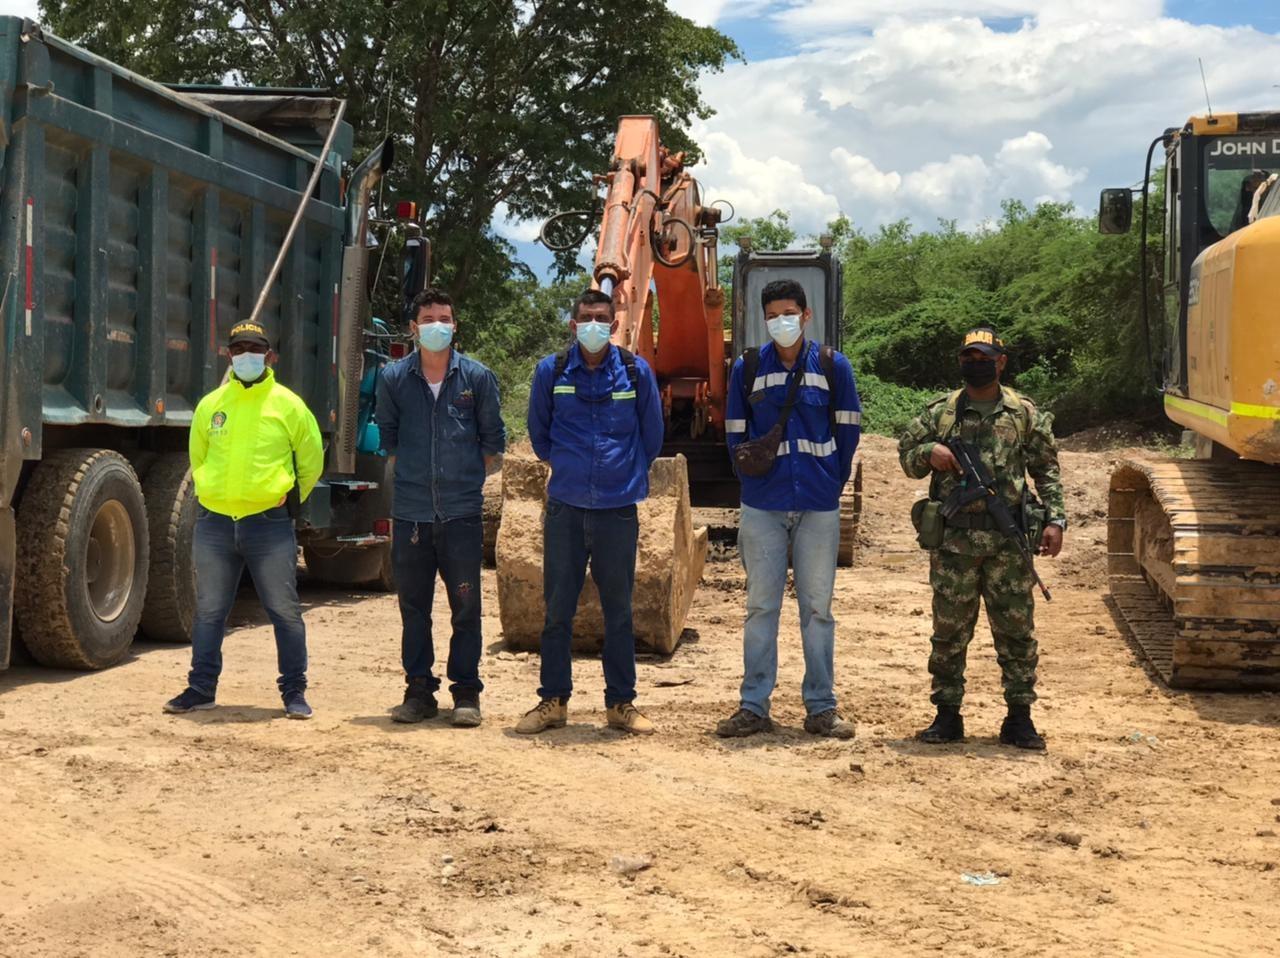 hoyennoticia.com, Tres capturados por practicar minería ilegal